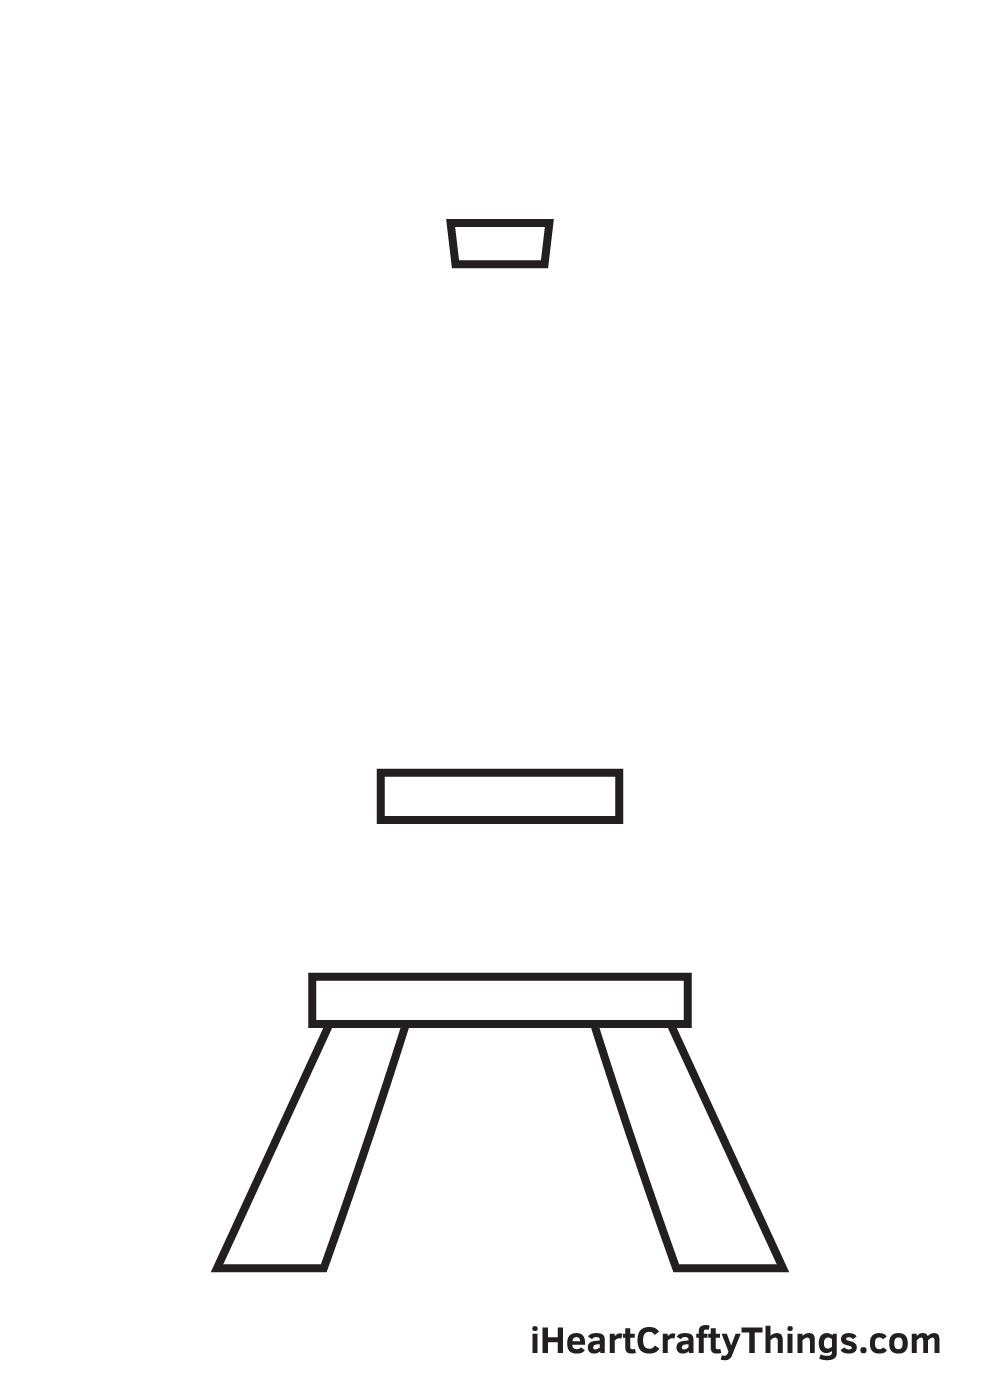 Eiffel Tower drawing - step 2